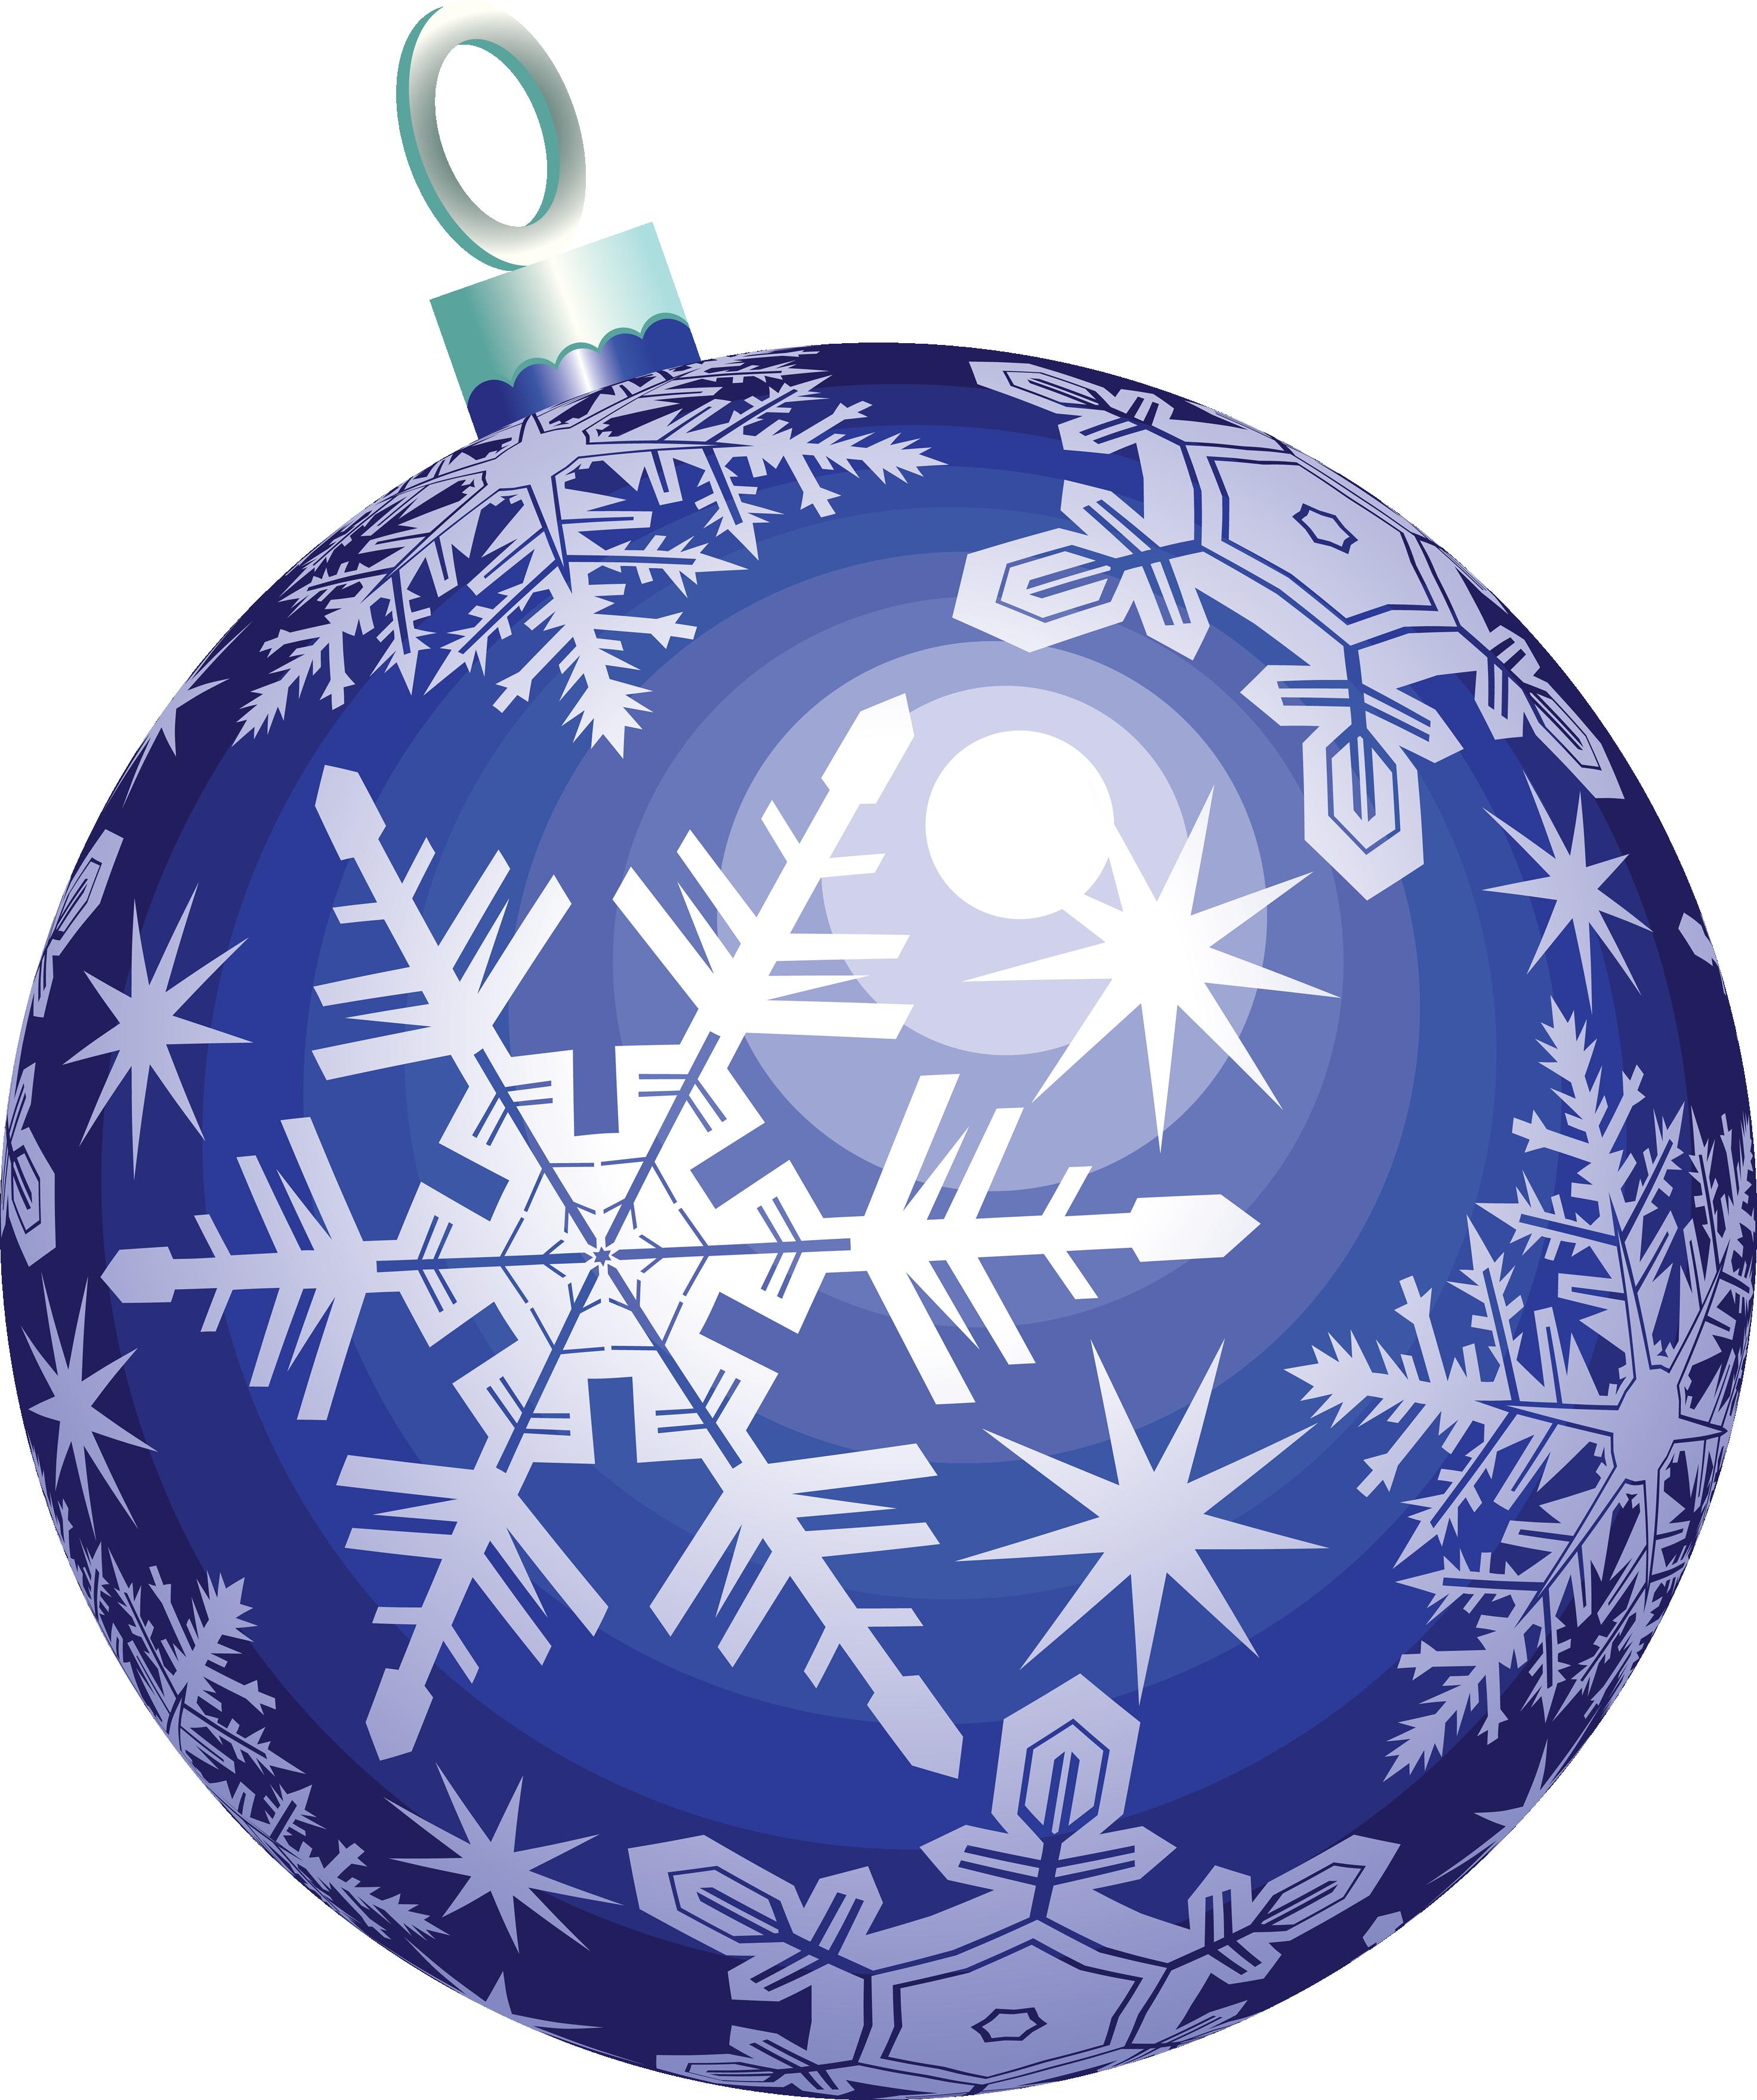 Christmas Ball PNG Transparent Christmas Ball.PNG Images..